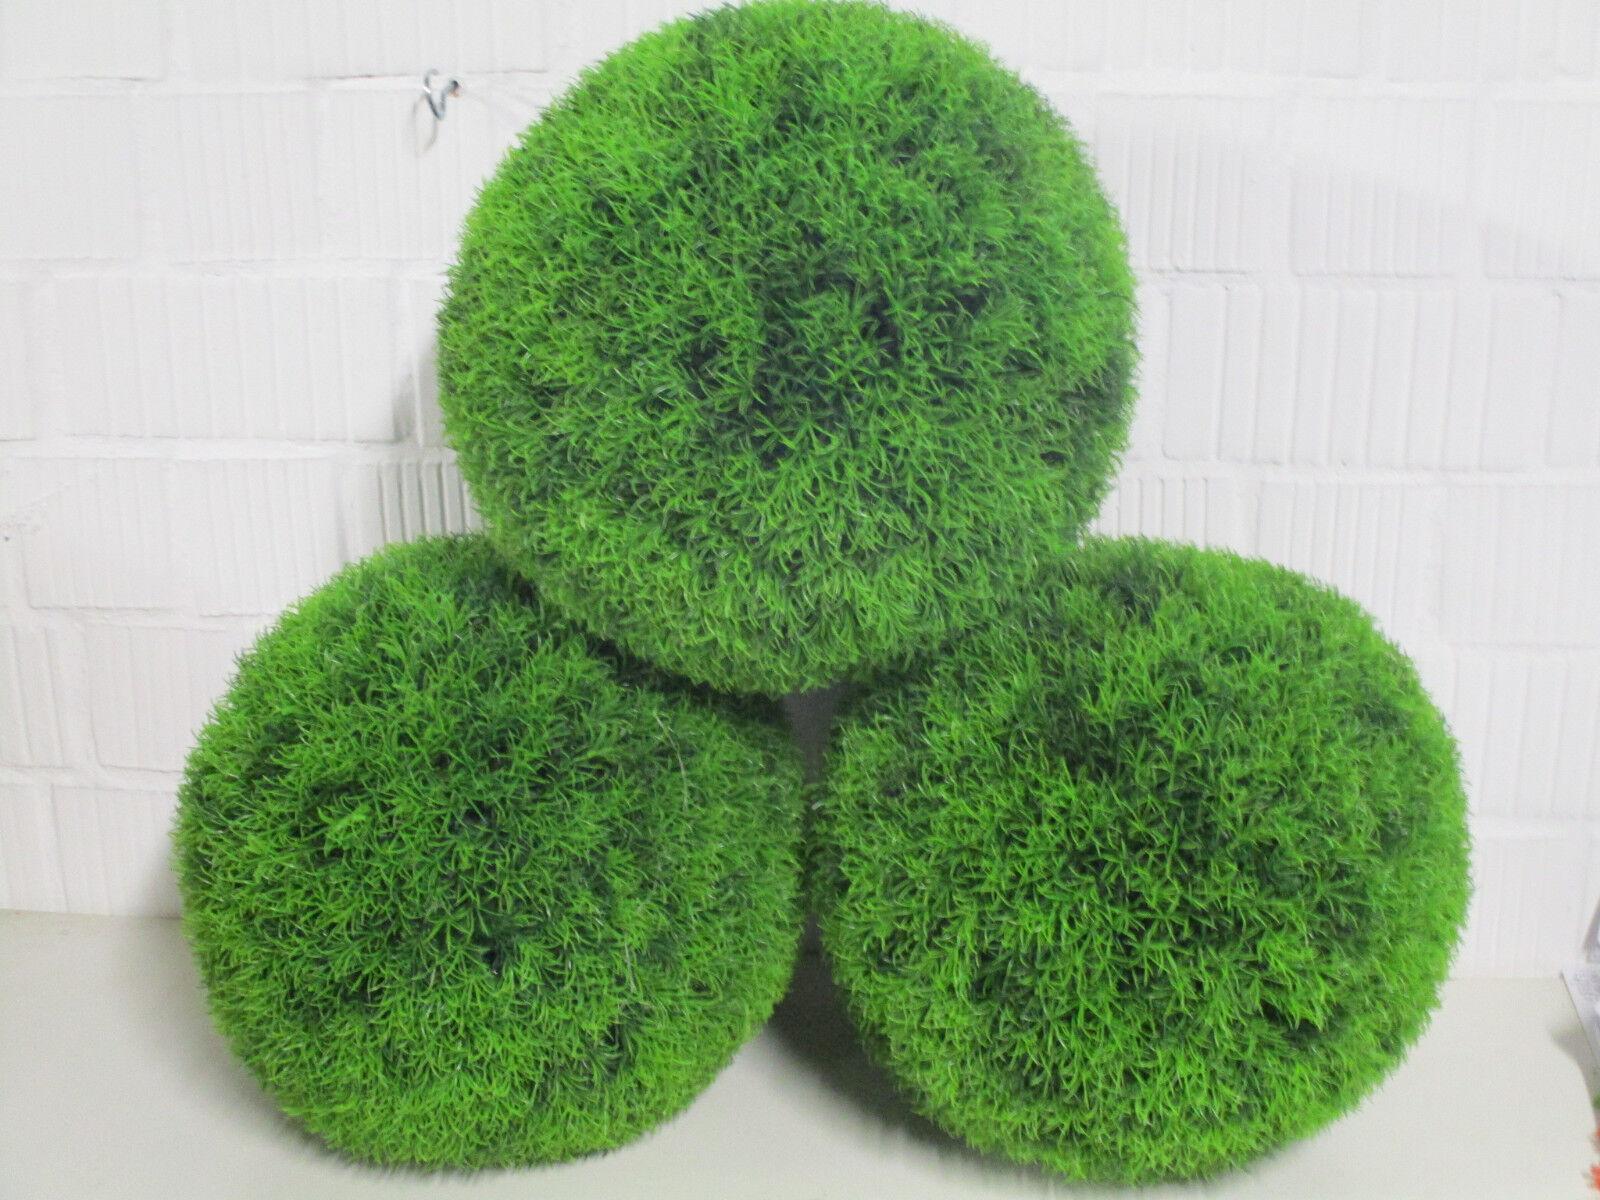 6 Stk. Graskugel künstlich 38 cm Garten Deko KunstBlaumen Kugel Gras wie echt Neu